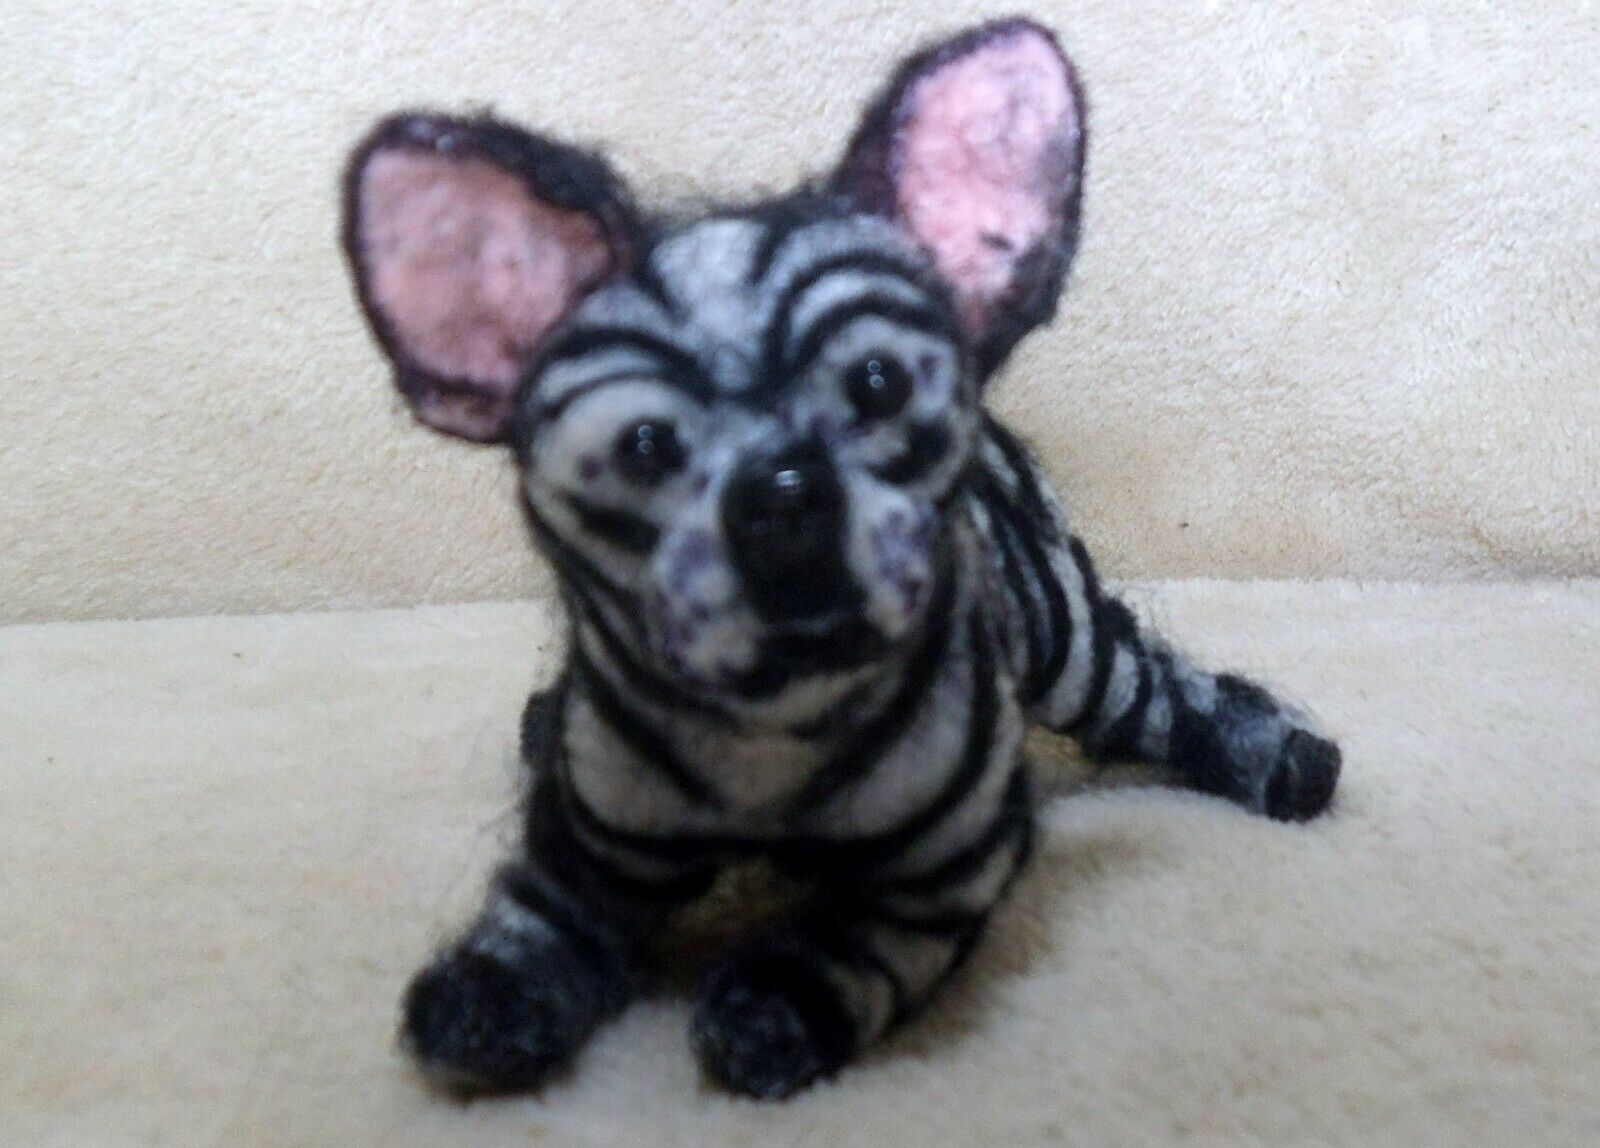 OOAK Needle Felted Artist Handcraft/handmade Dog French Bull Dog With Zebra Coat - $31.00